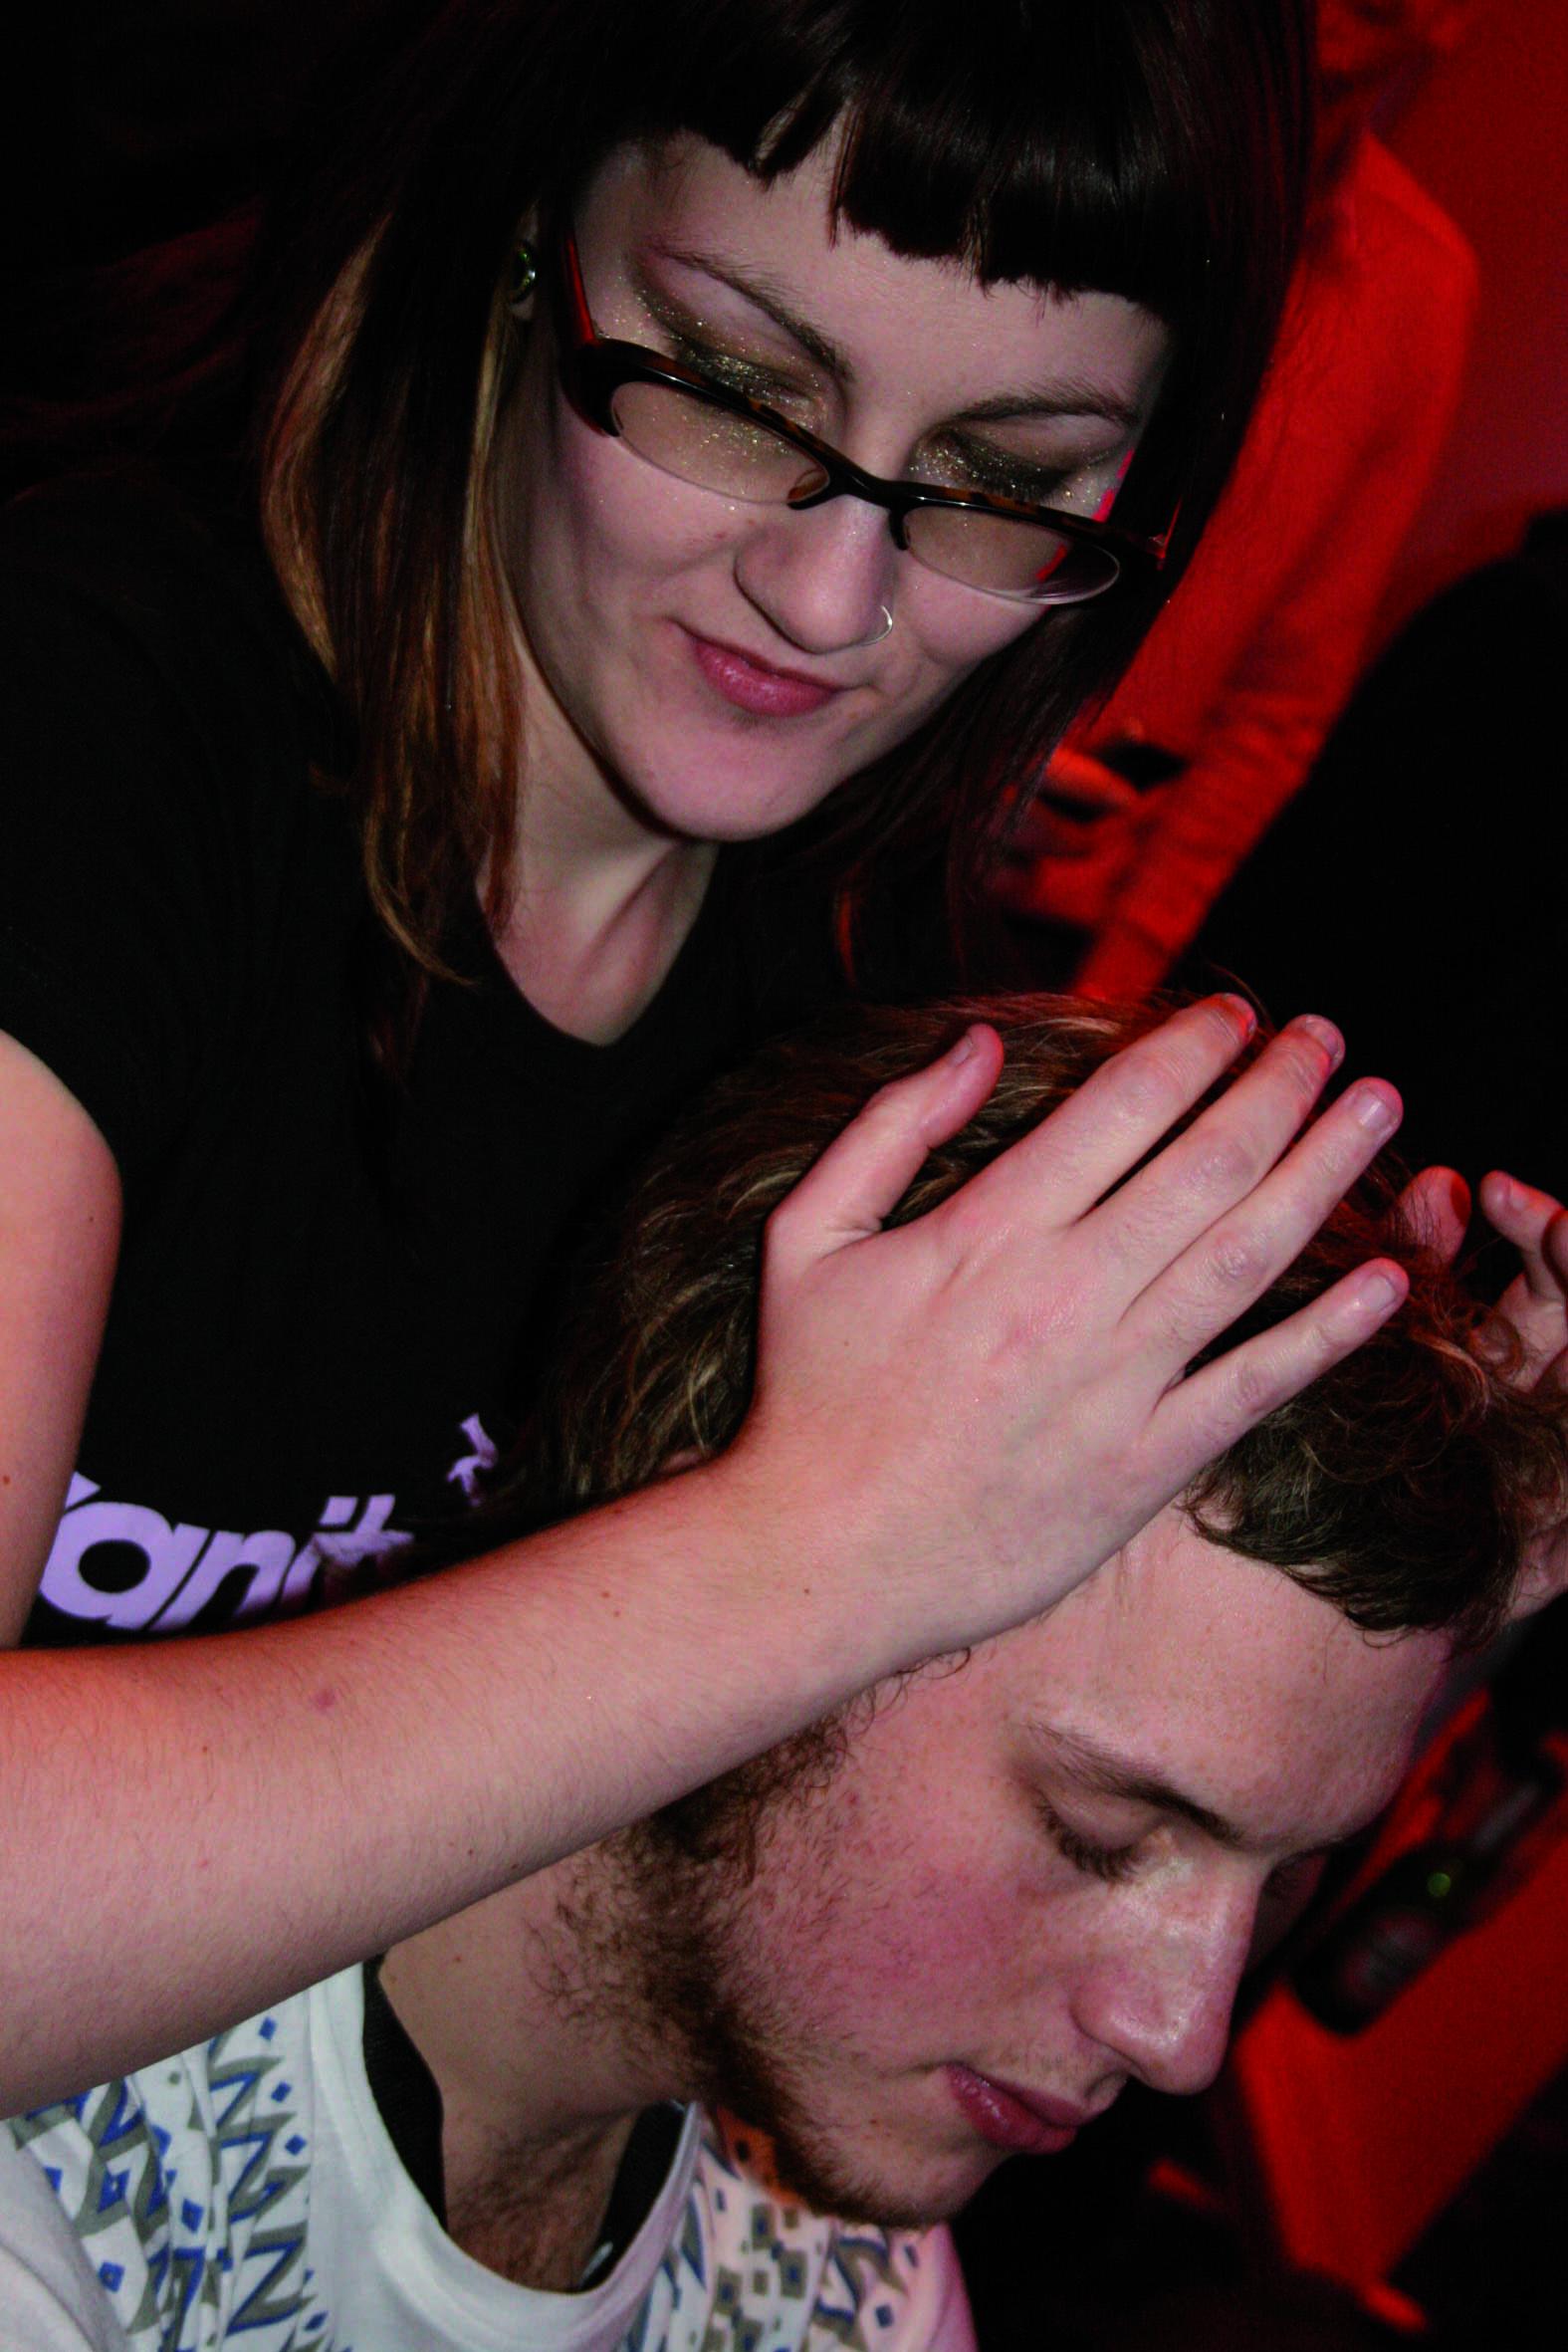 Massage treatment event staff